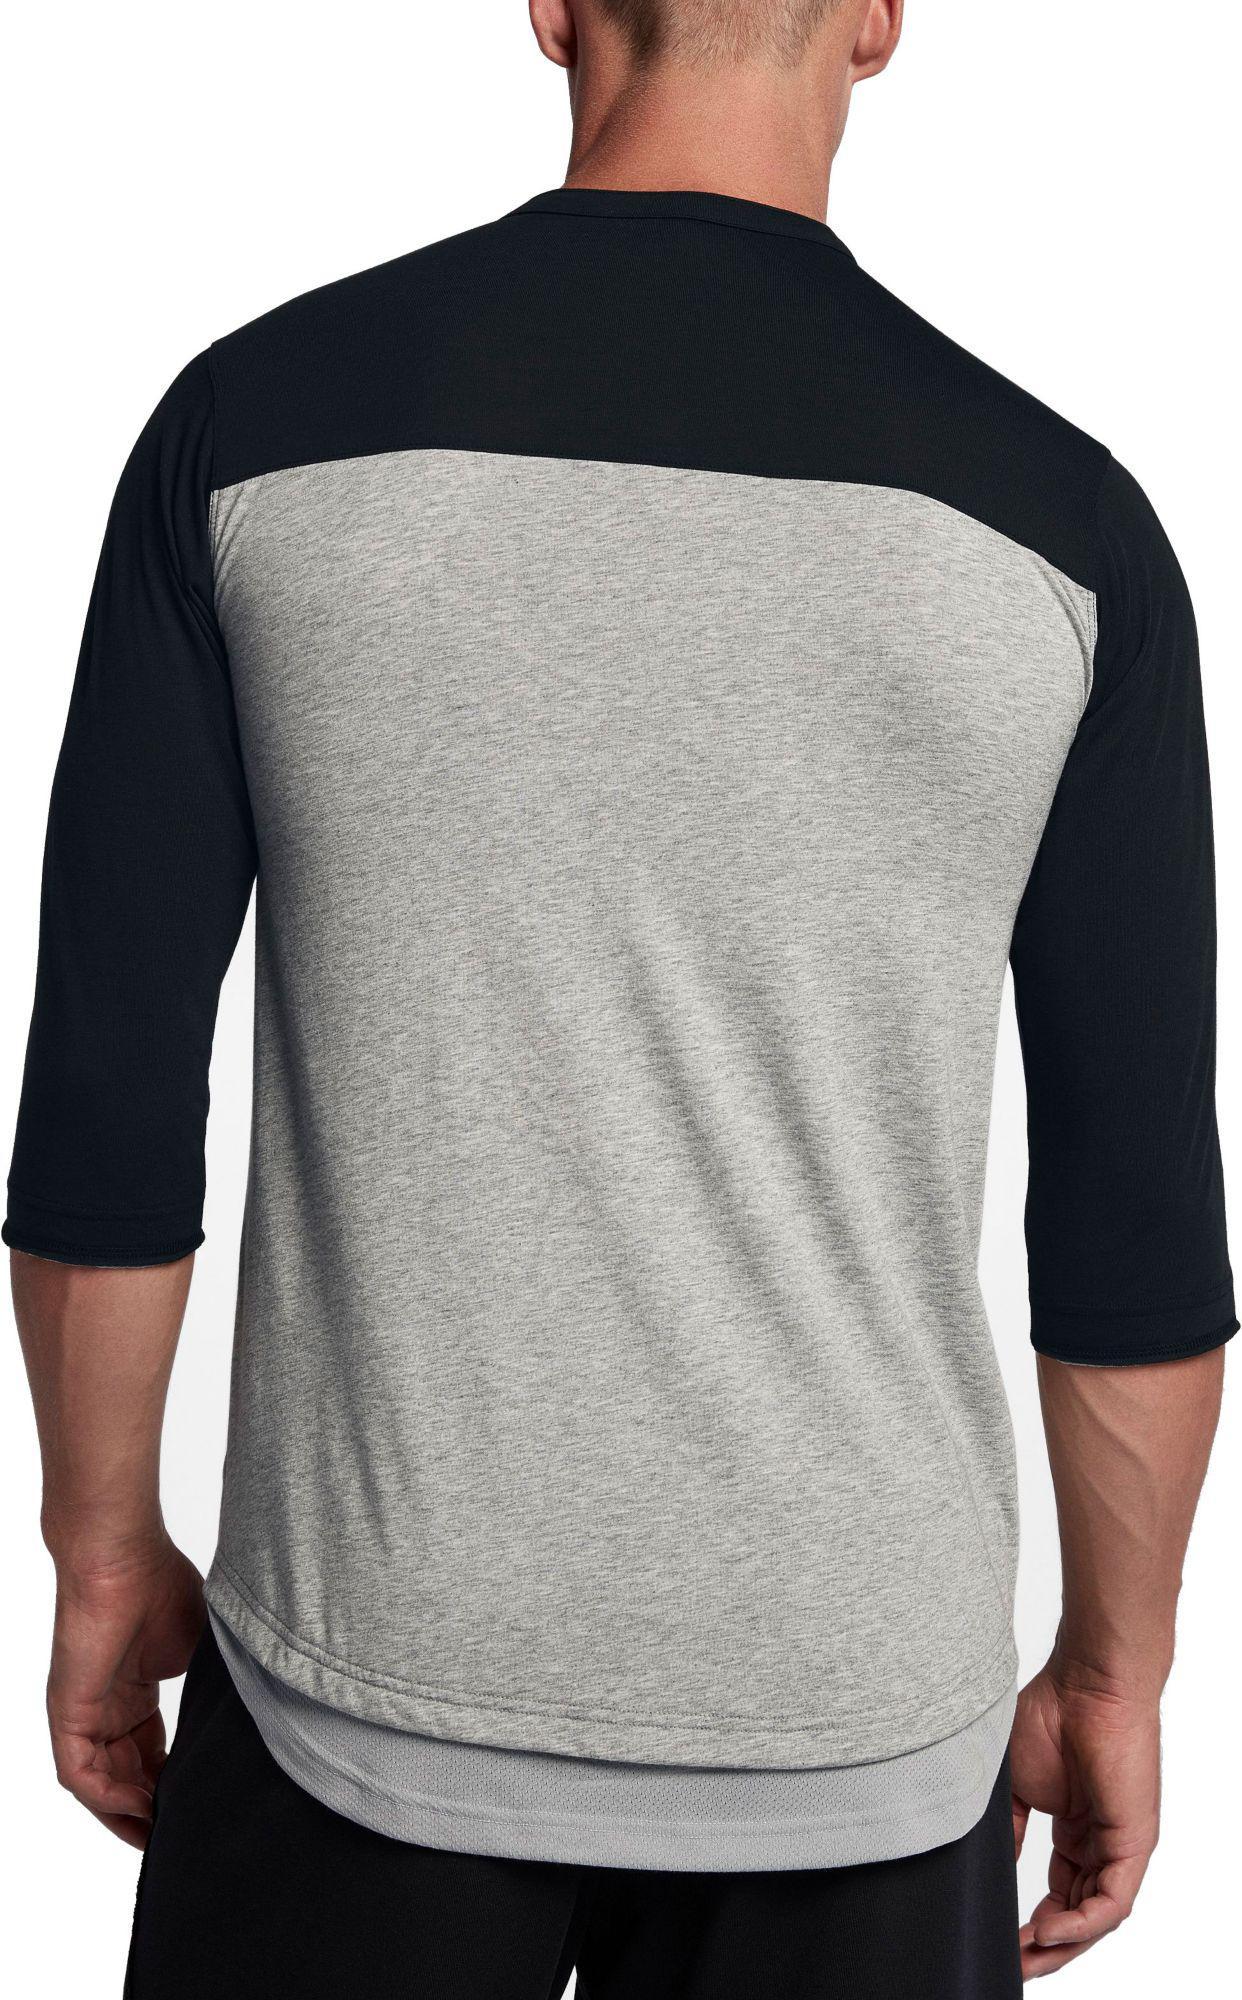 ef677168bd0fa Nike - Gray Flux 3⁄4 Sleeve Henley Baseball Top for Men - Lyst. View  fullscreen